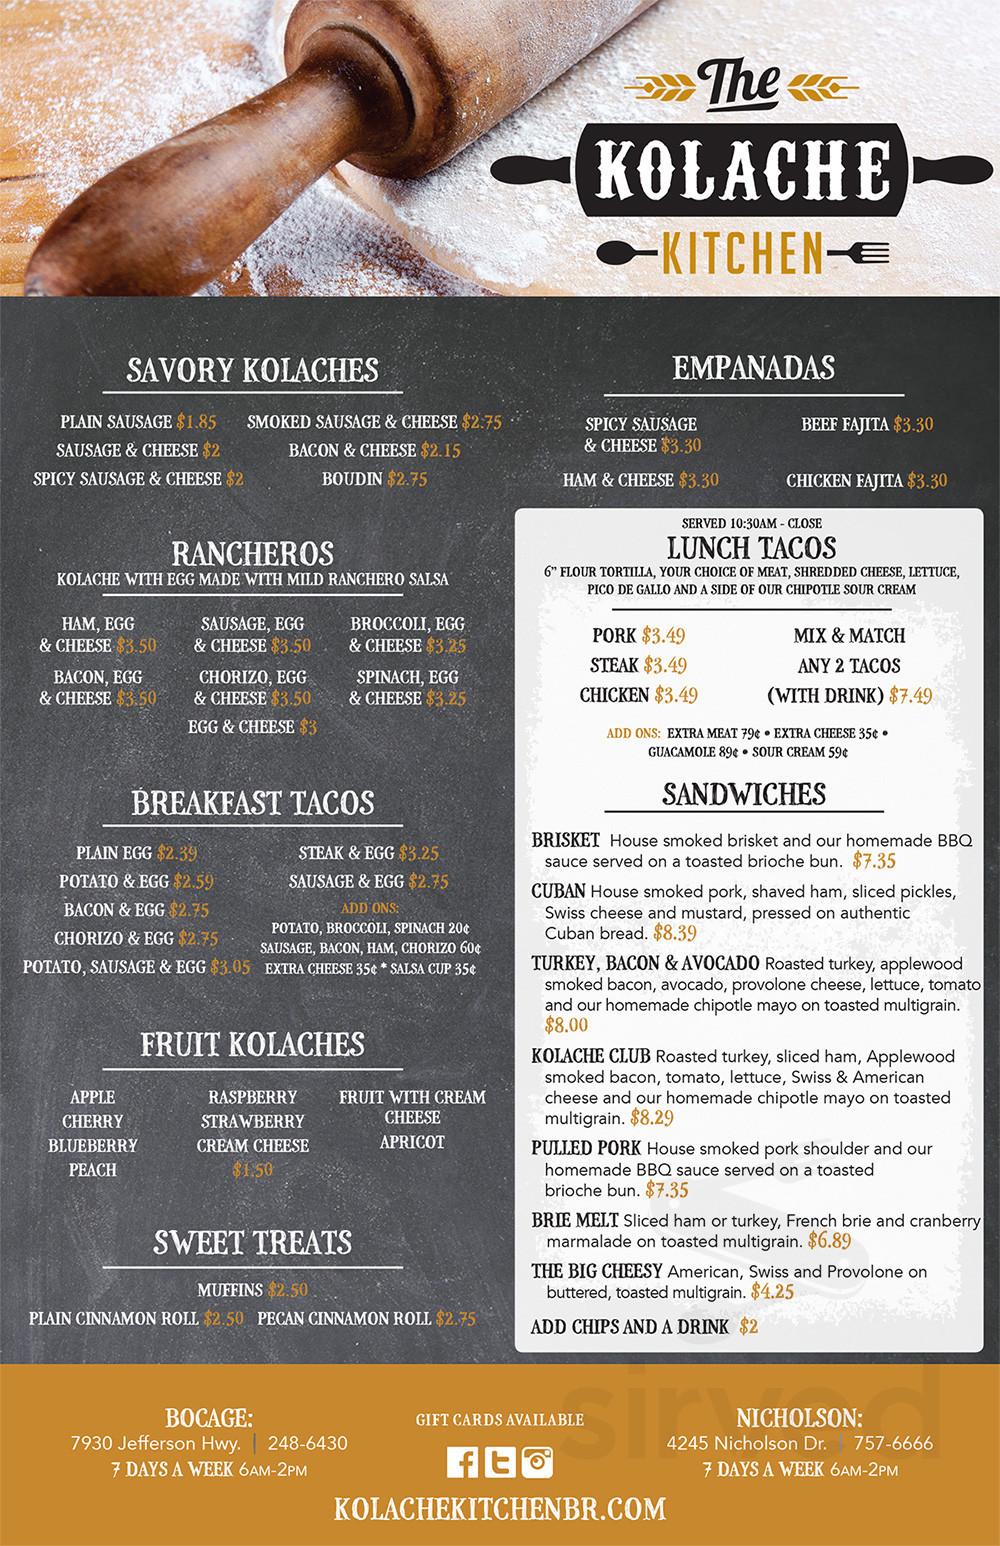 The Kolache Kitchen Bocage Menu In Baton Rouge Louisiana Usa